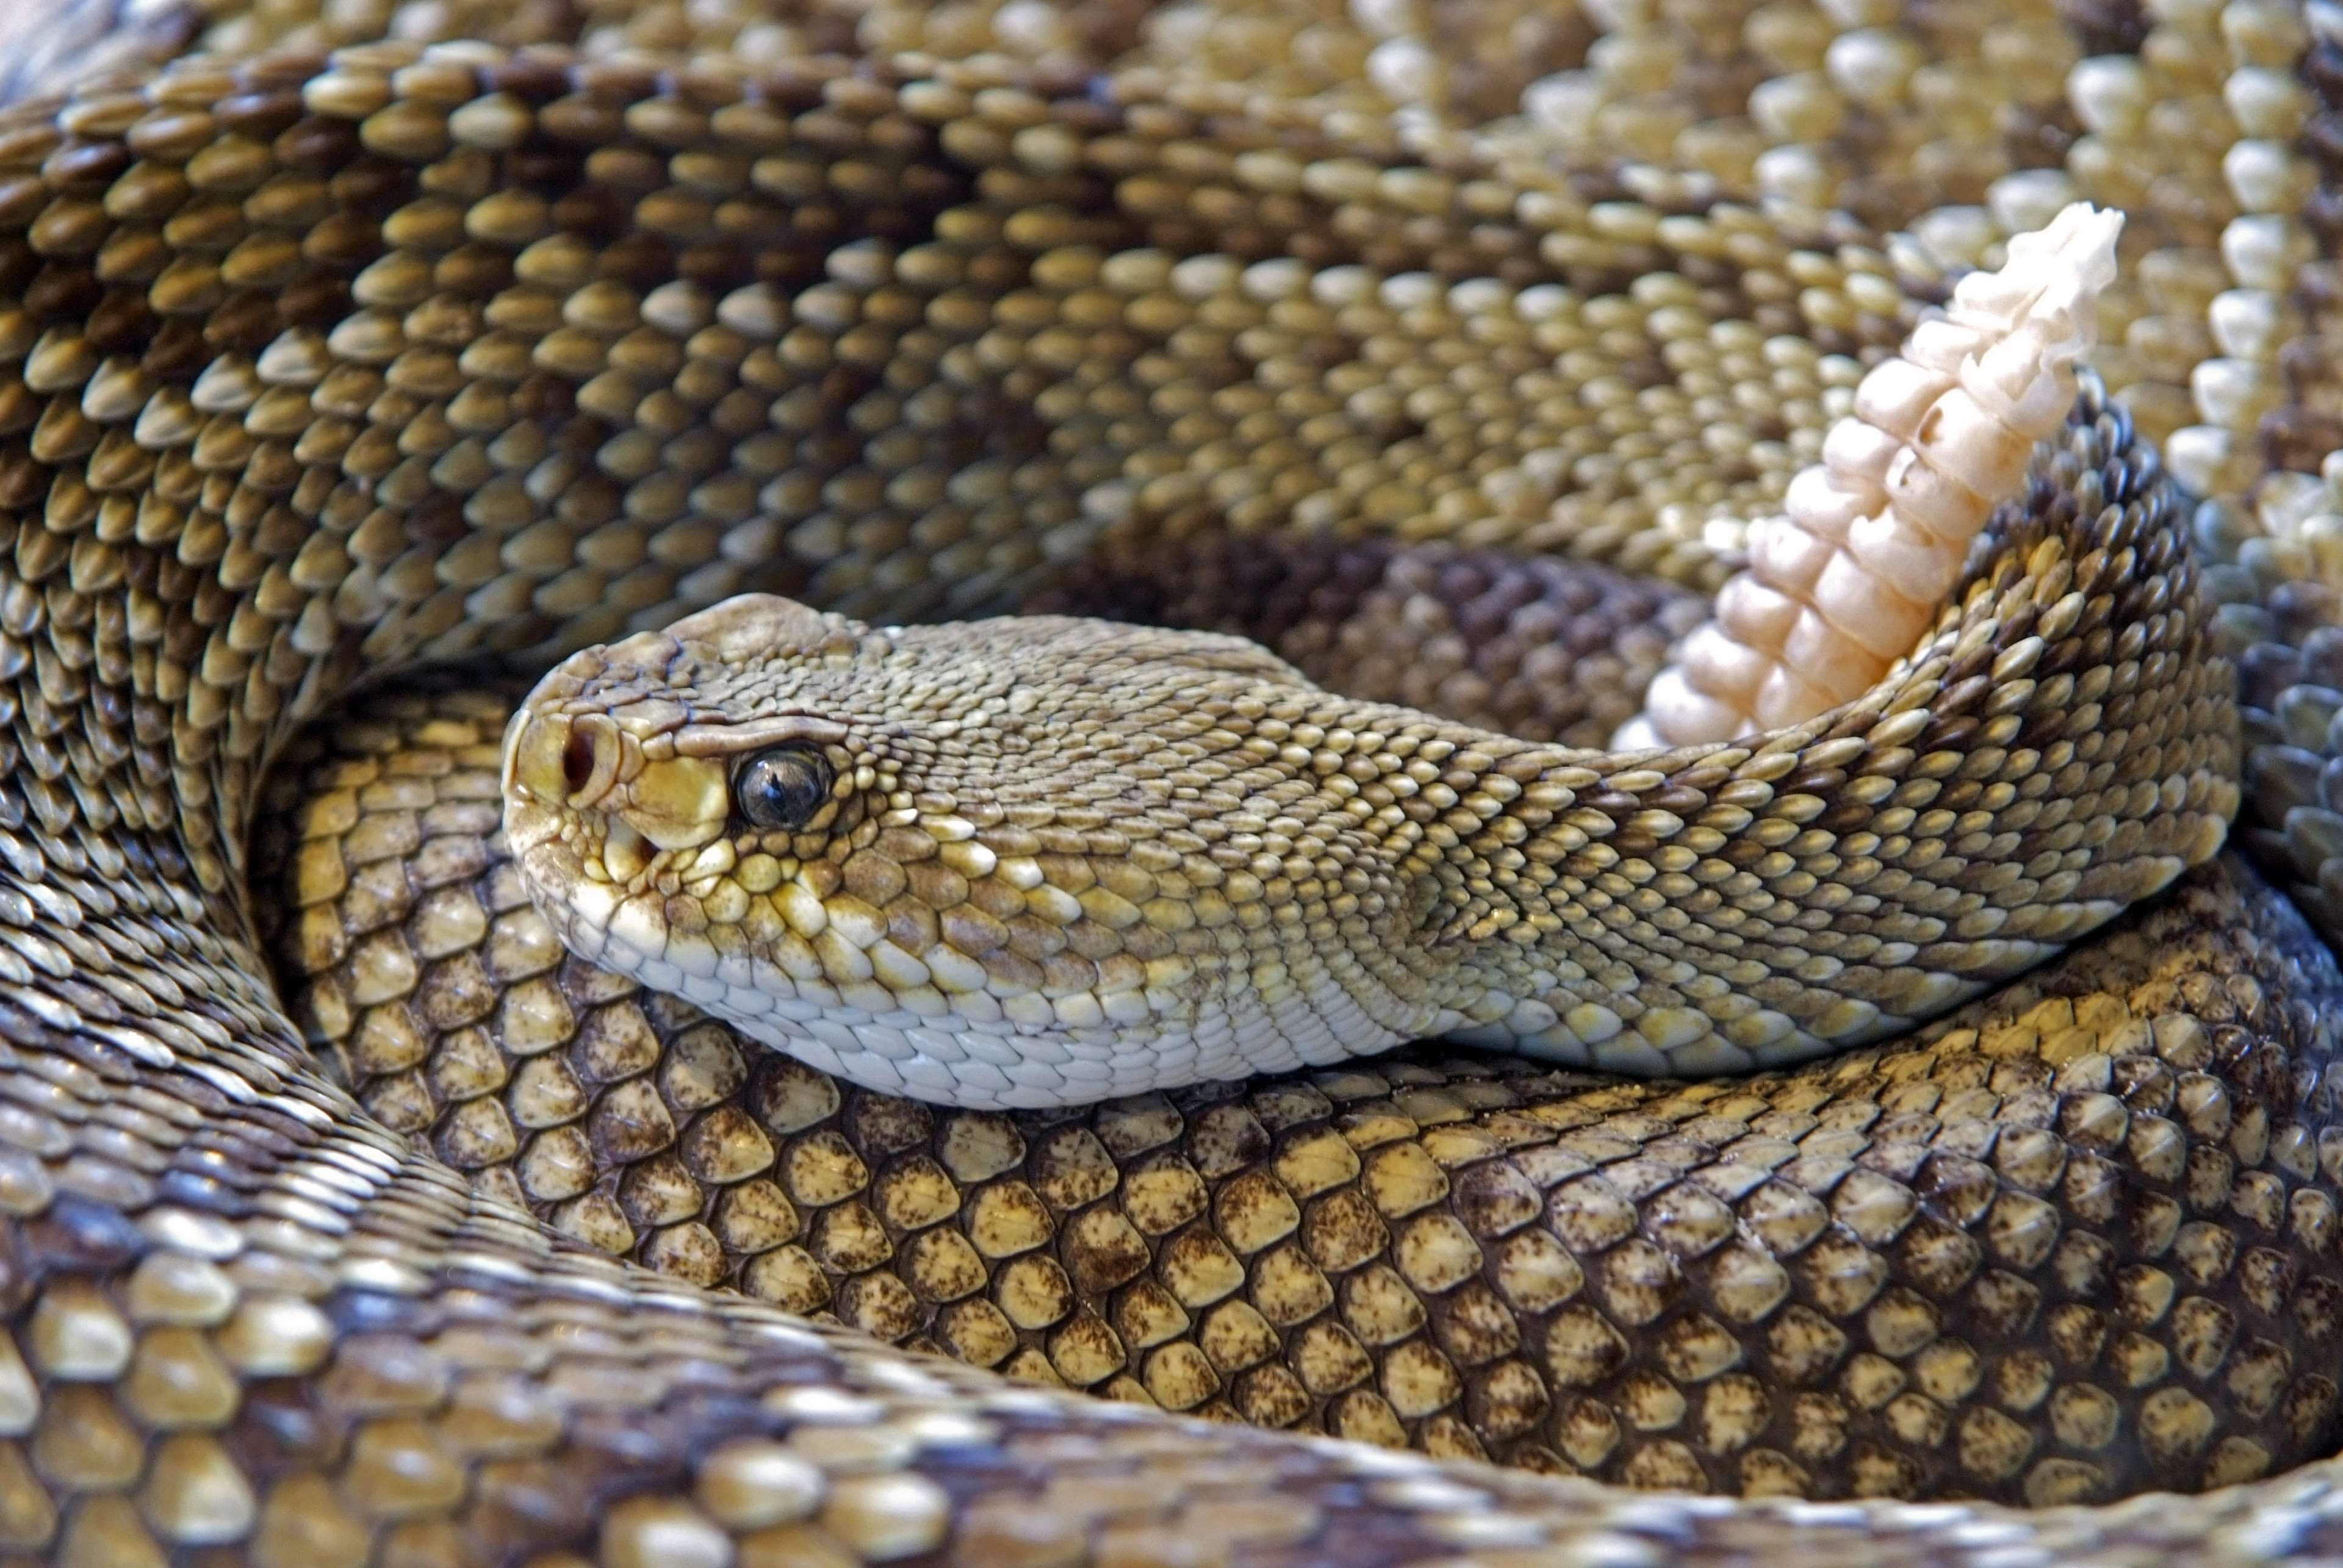 animal #caution #dangerous #hunter #lethal #poisonous #rattlesnake ...